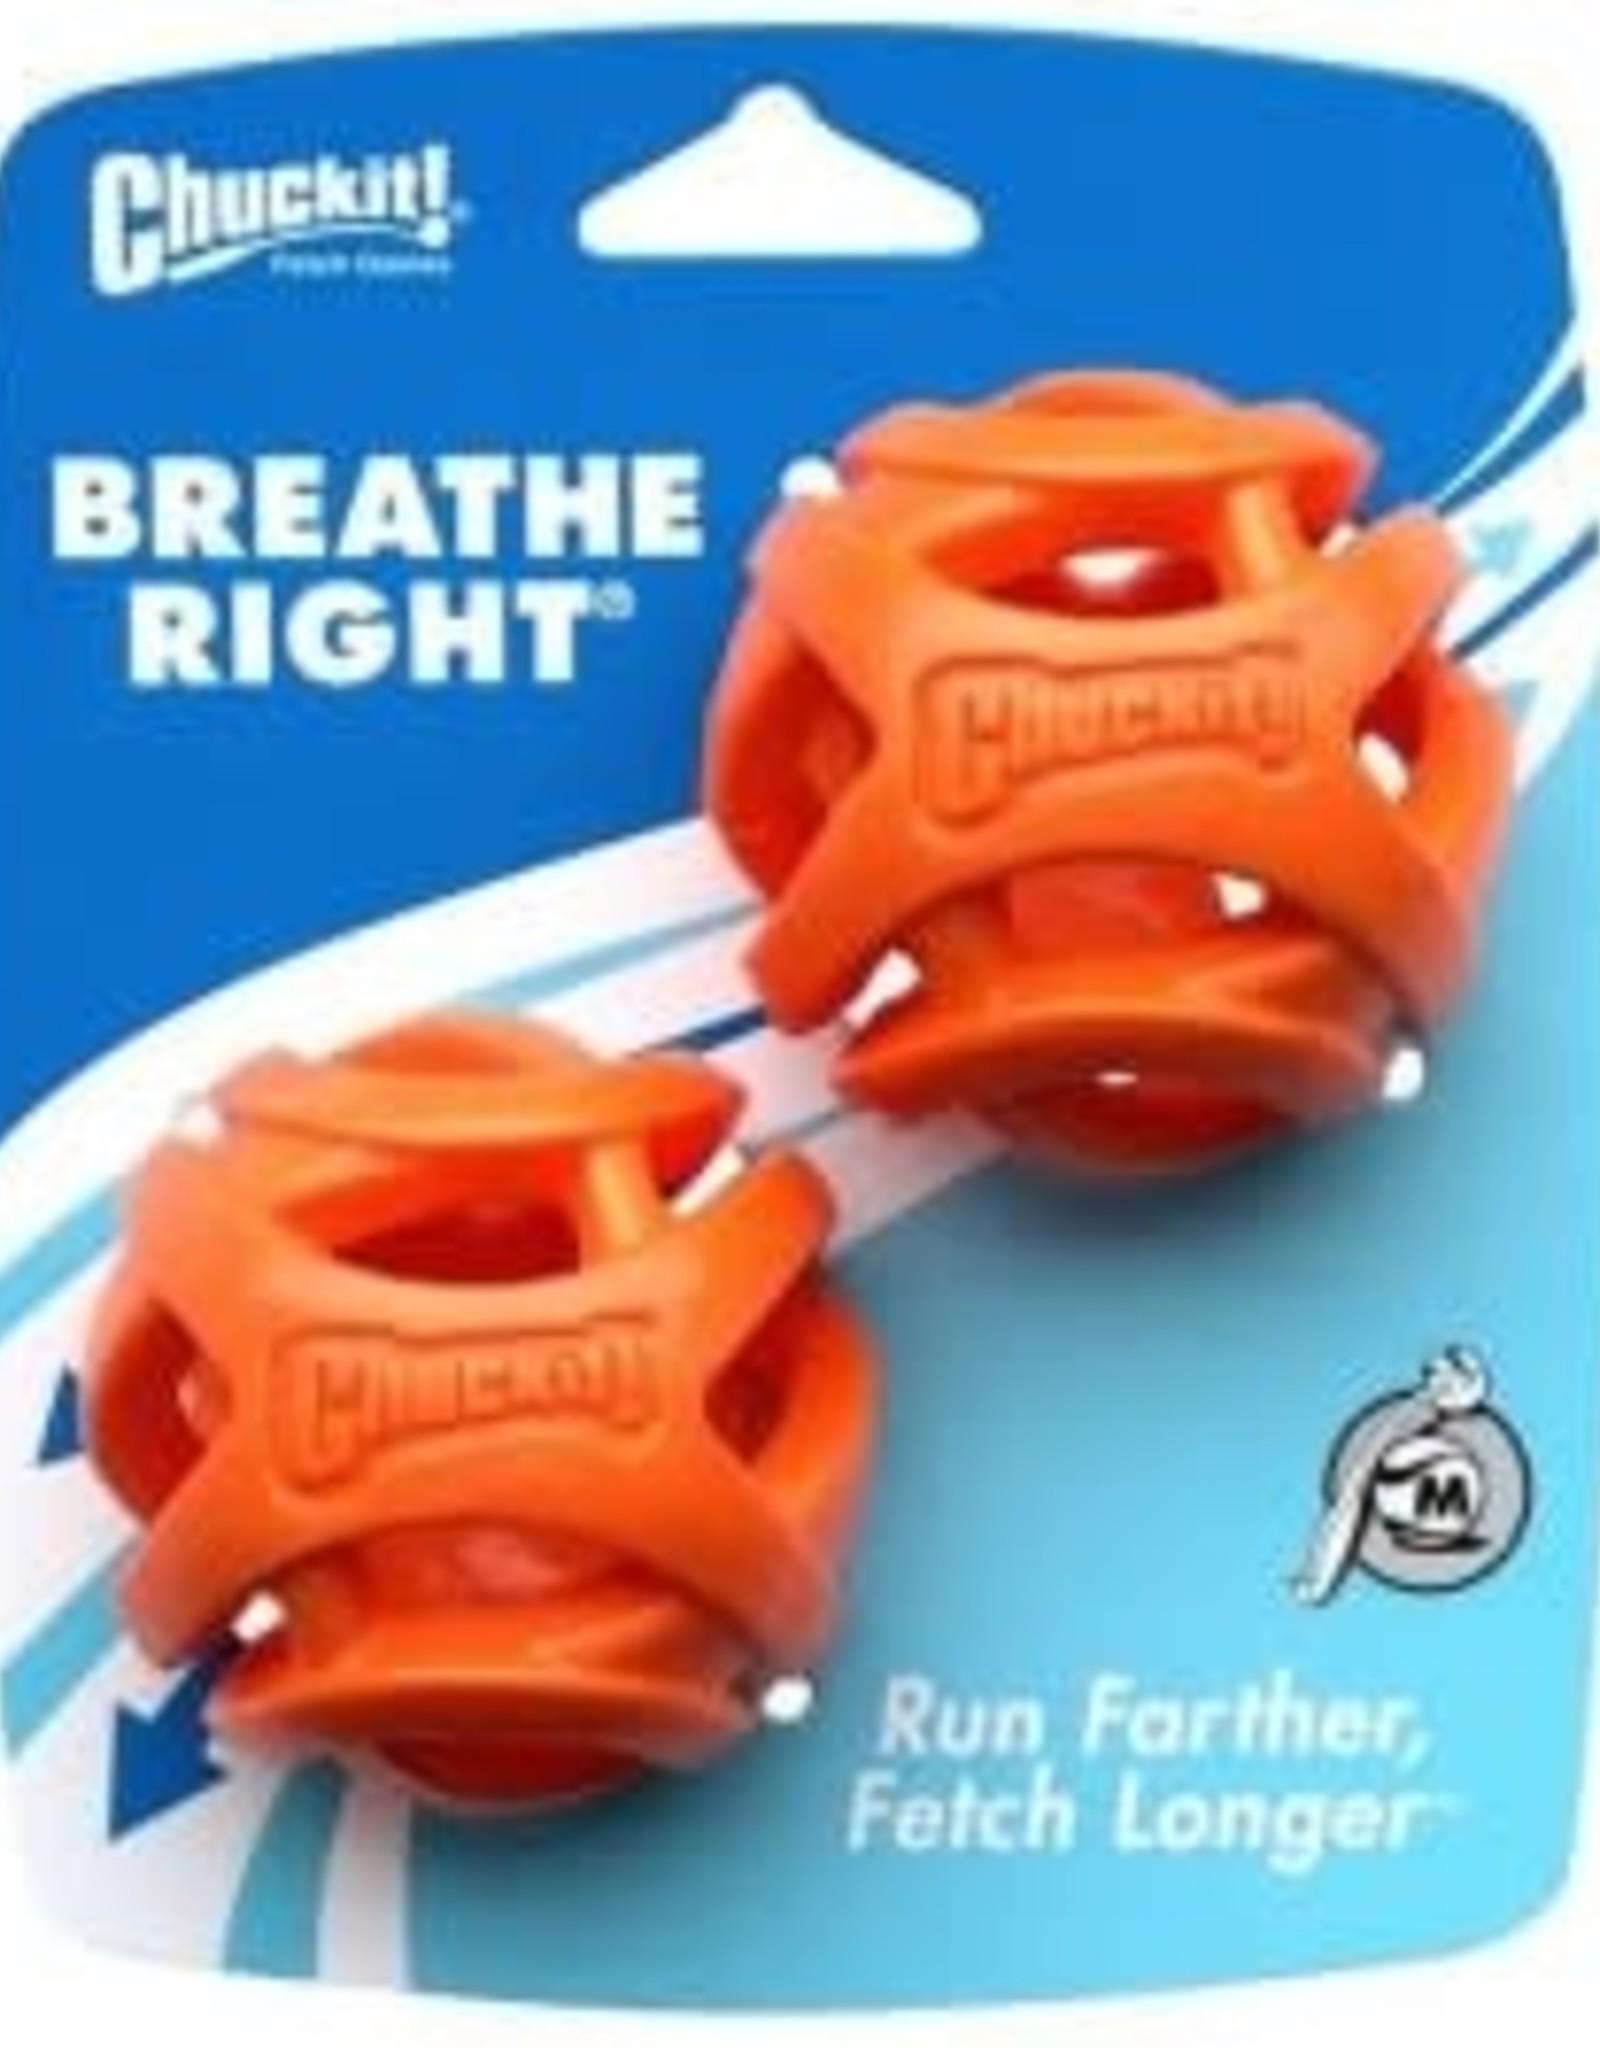 Chuckit Breathe Right Fetch Ball Dog Toy, Medium 5.5cm, 2 pack